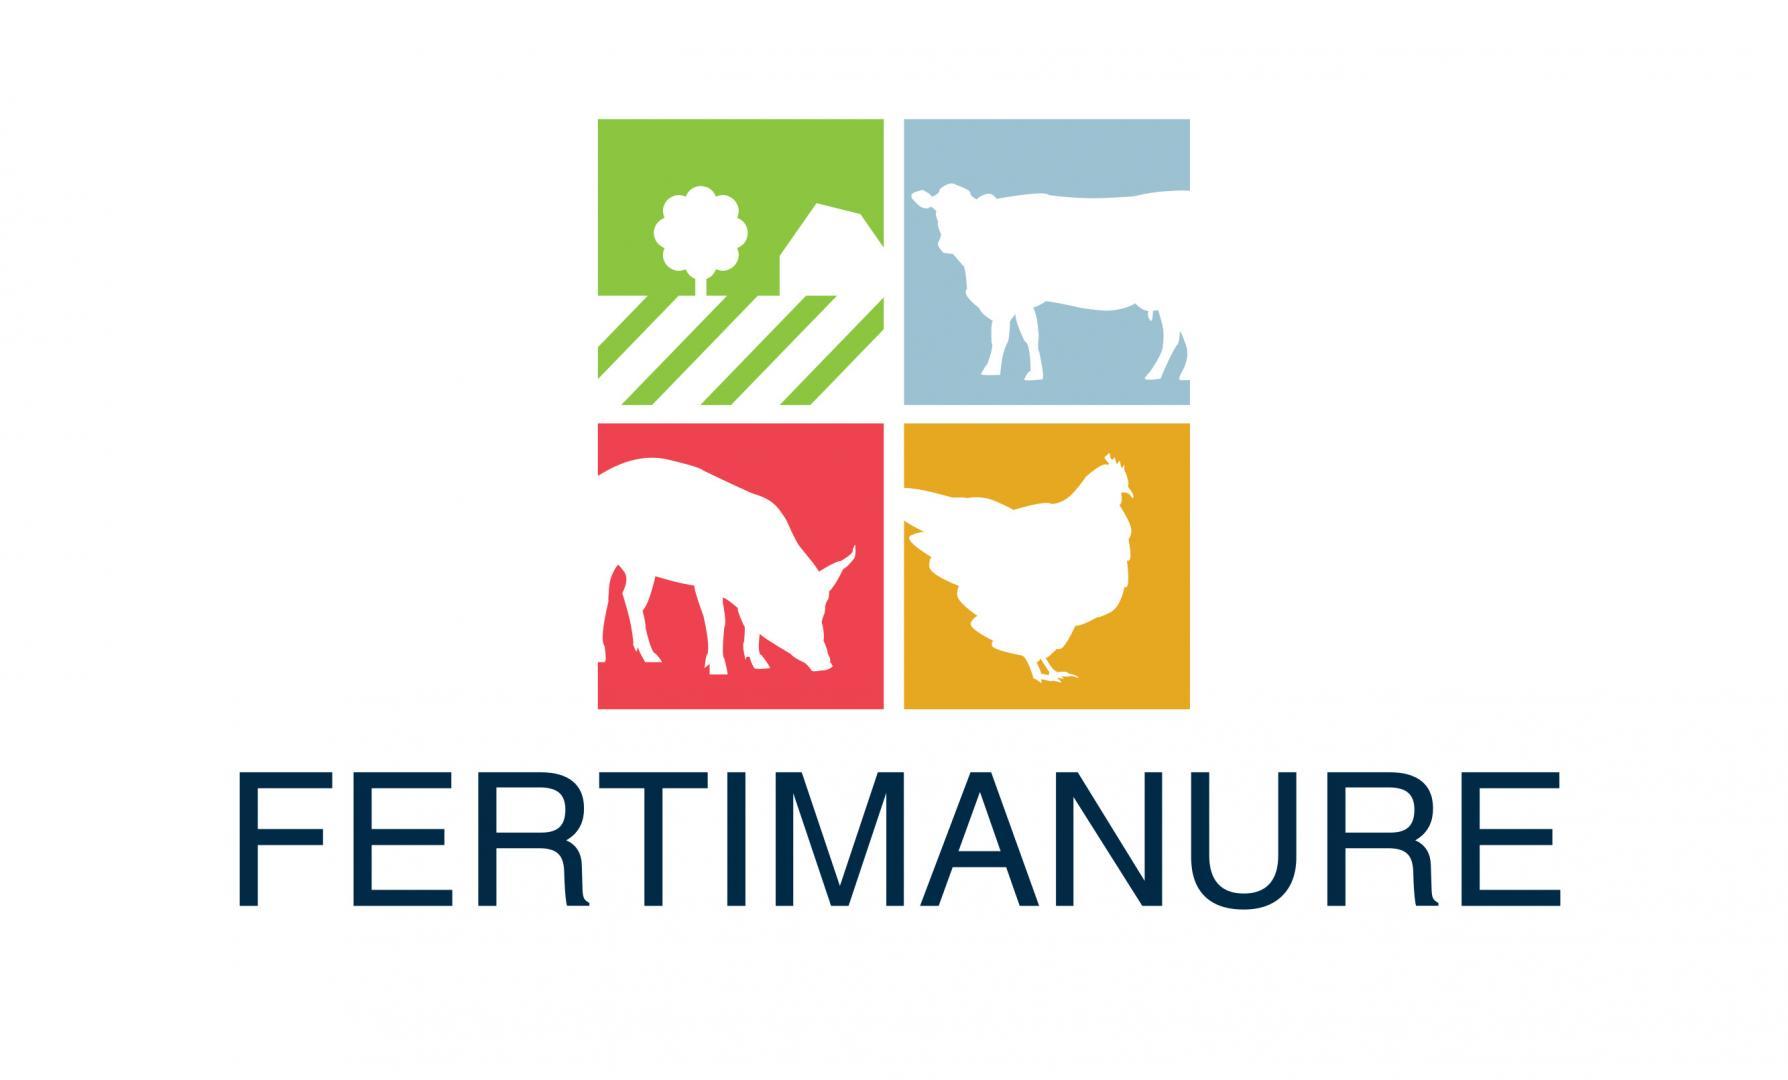 Fertimanure